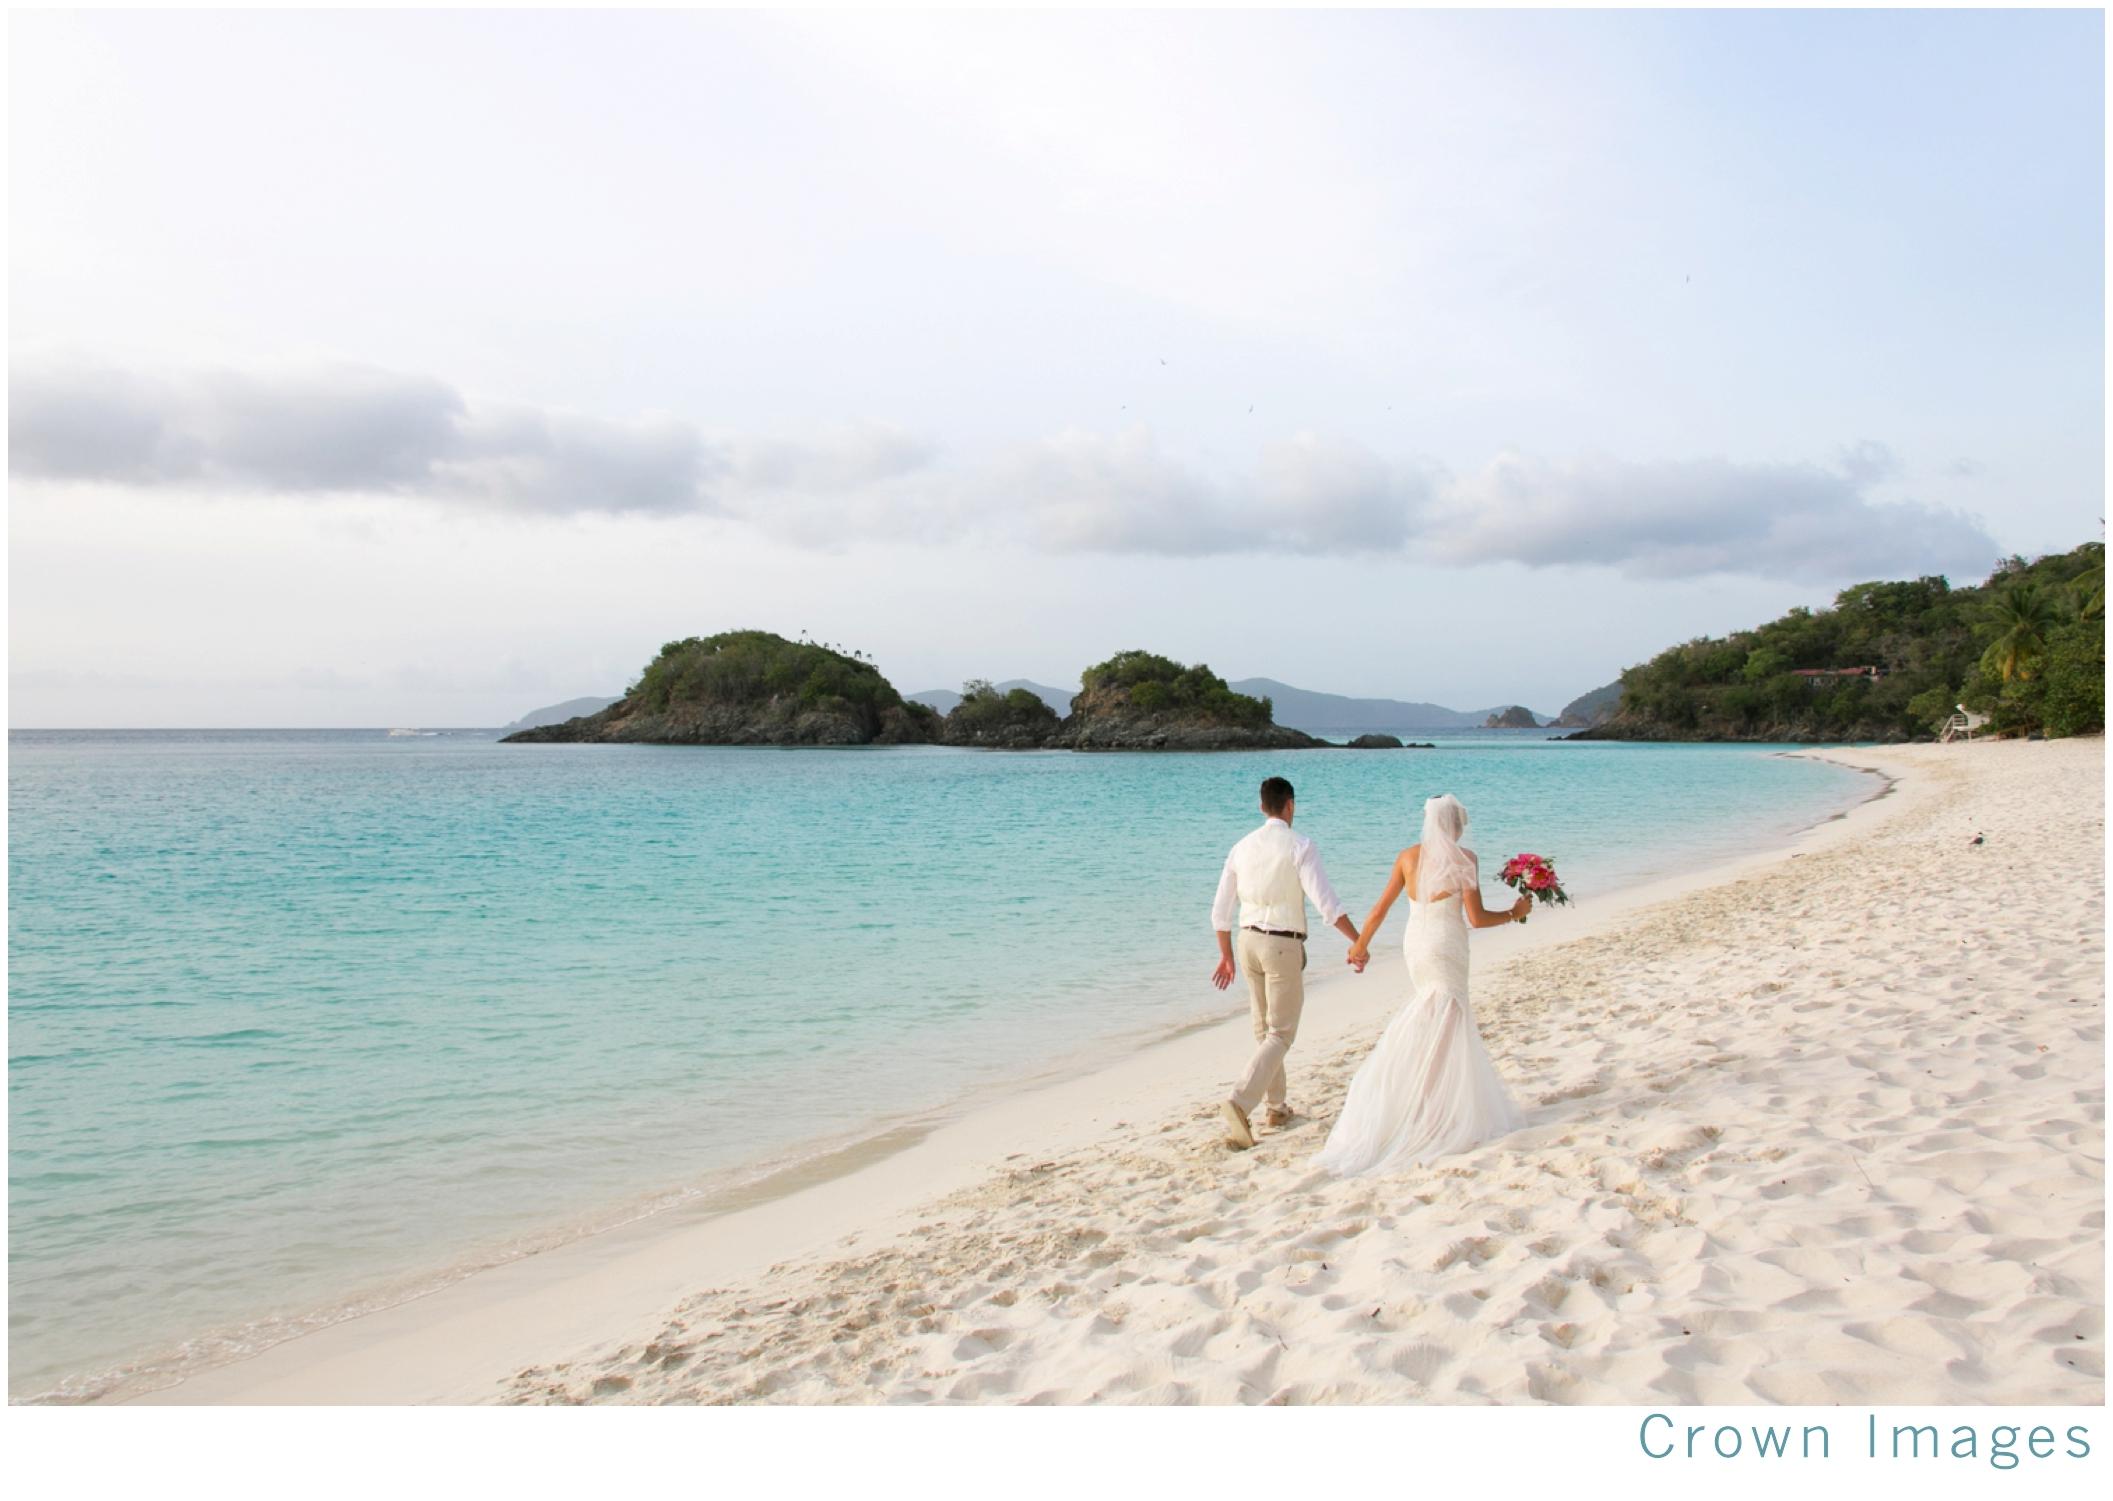 wedding photos crown images_1676.jpg